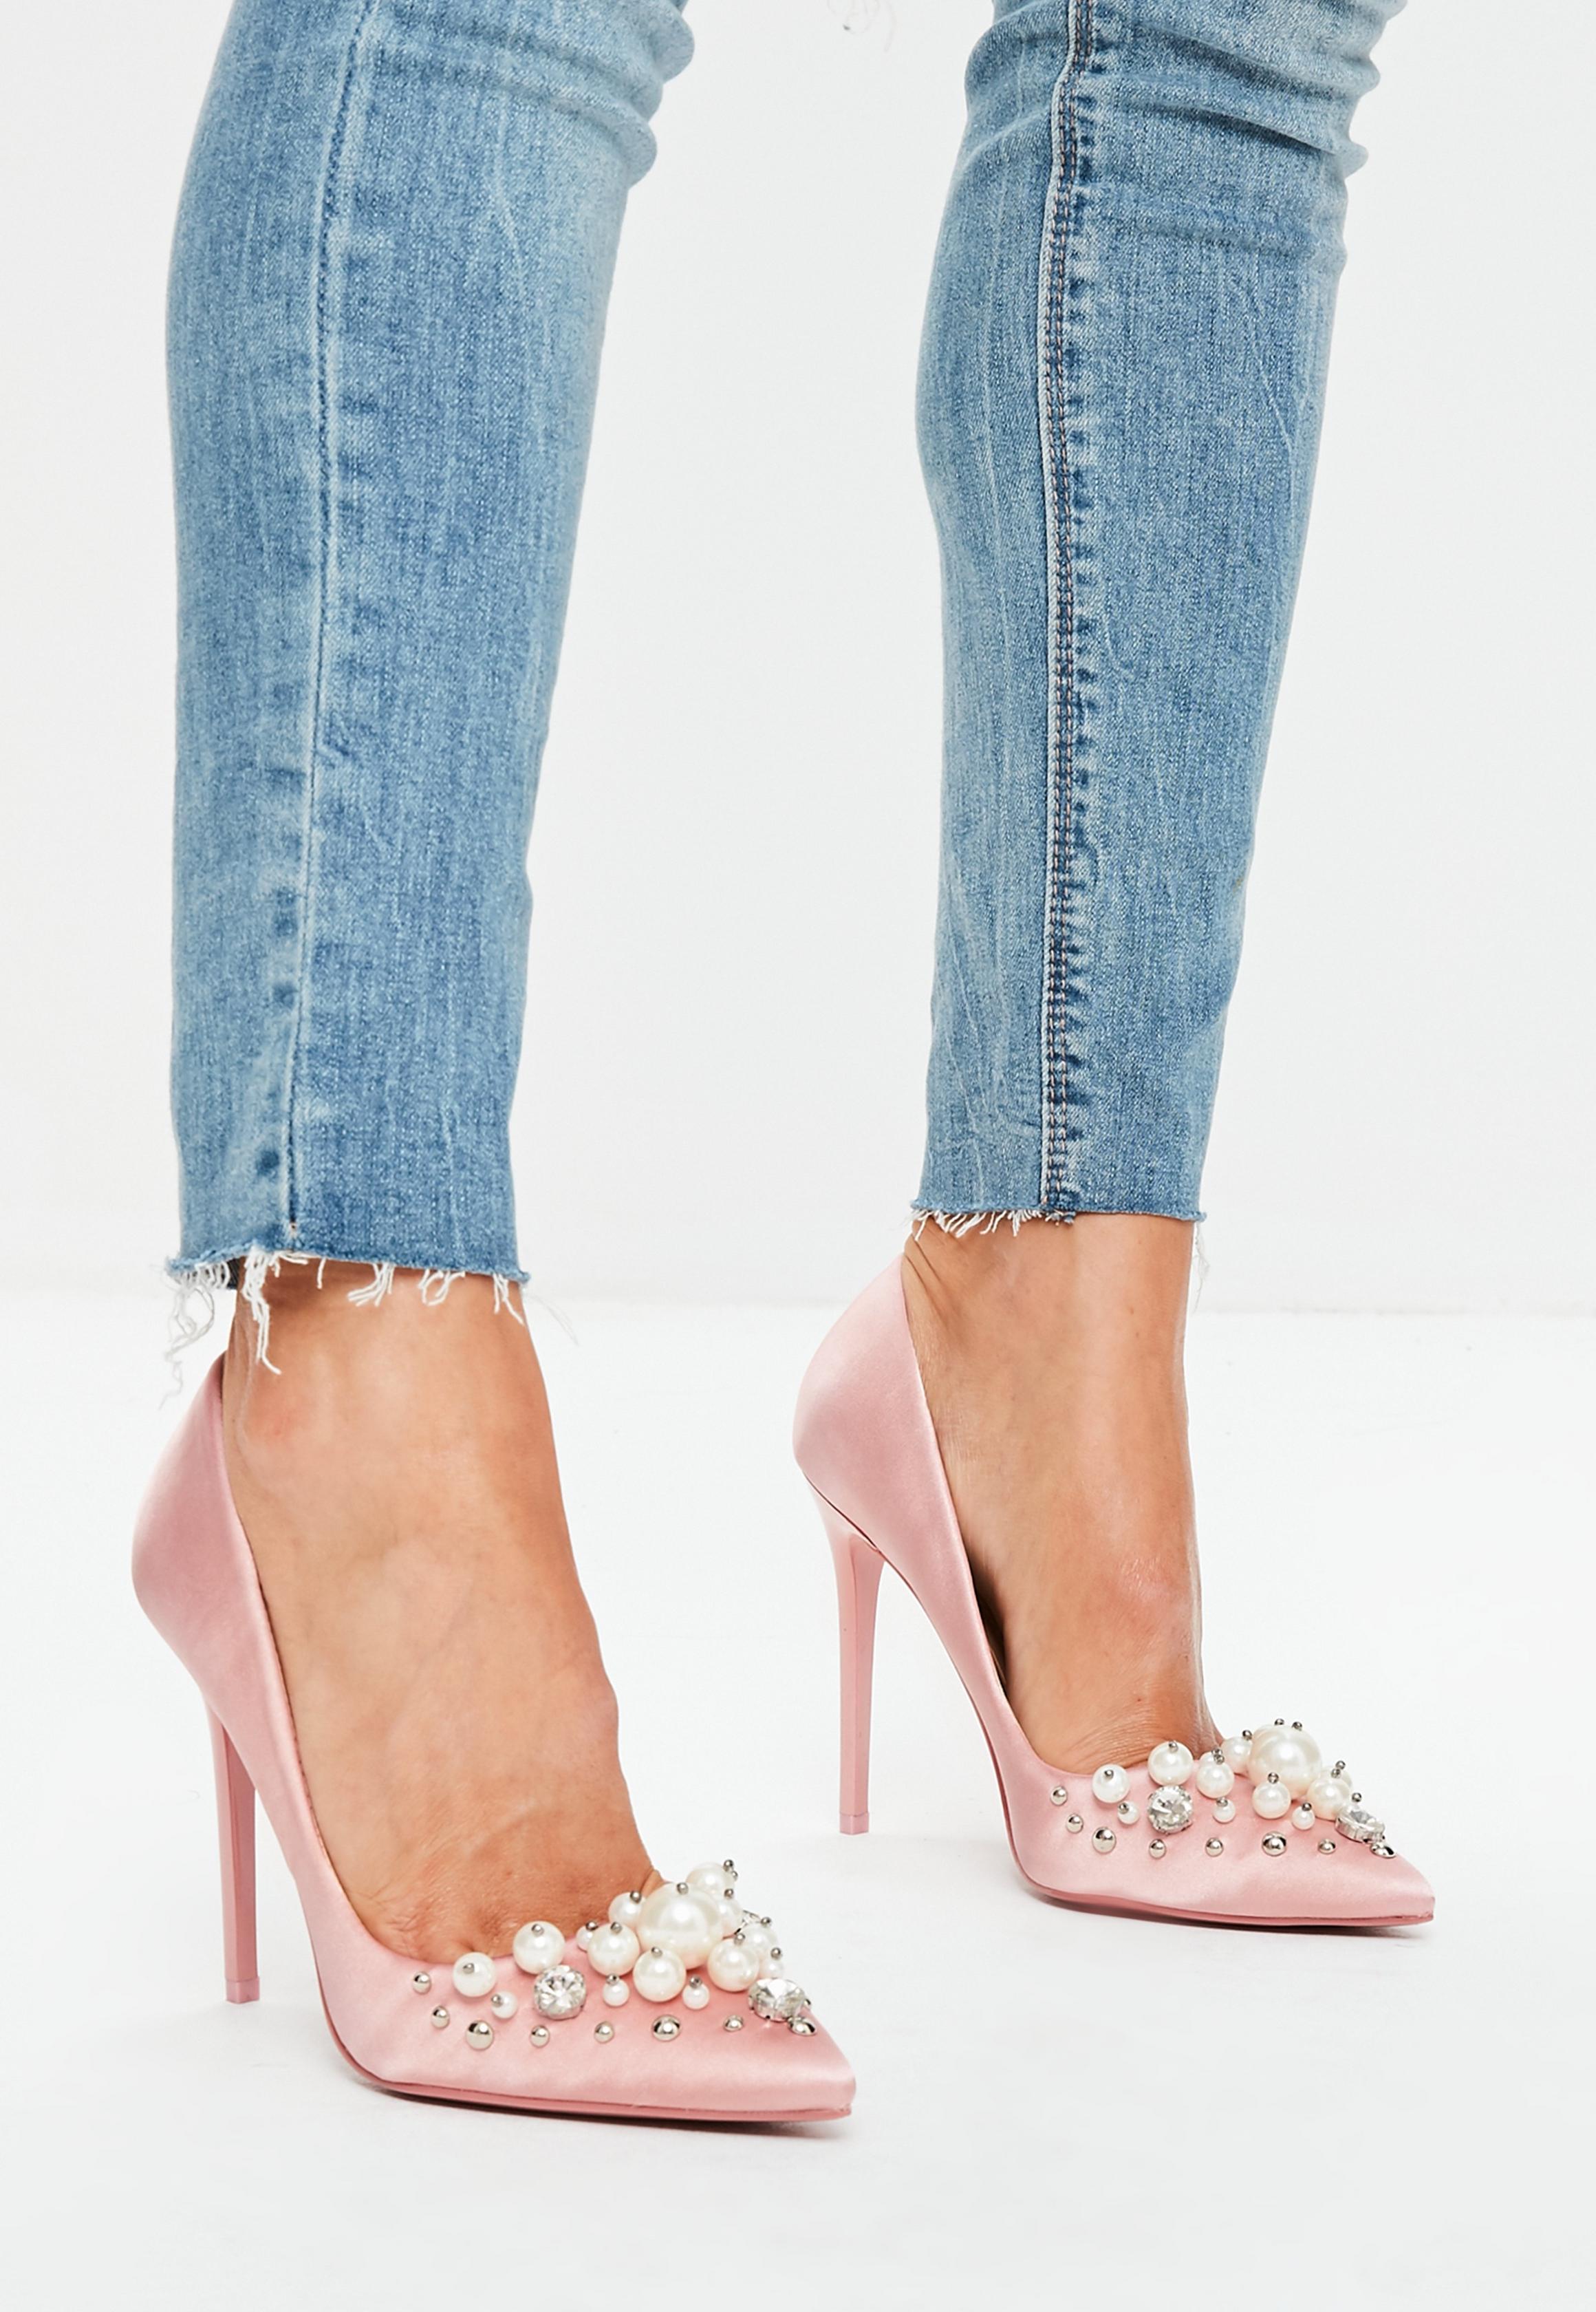 pink-pearl-embellished-pumps.jpg